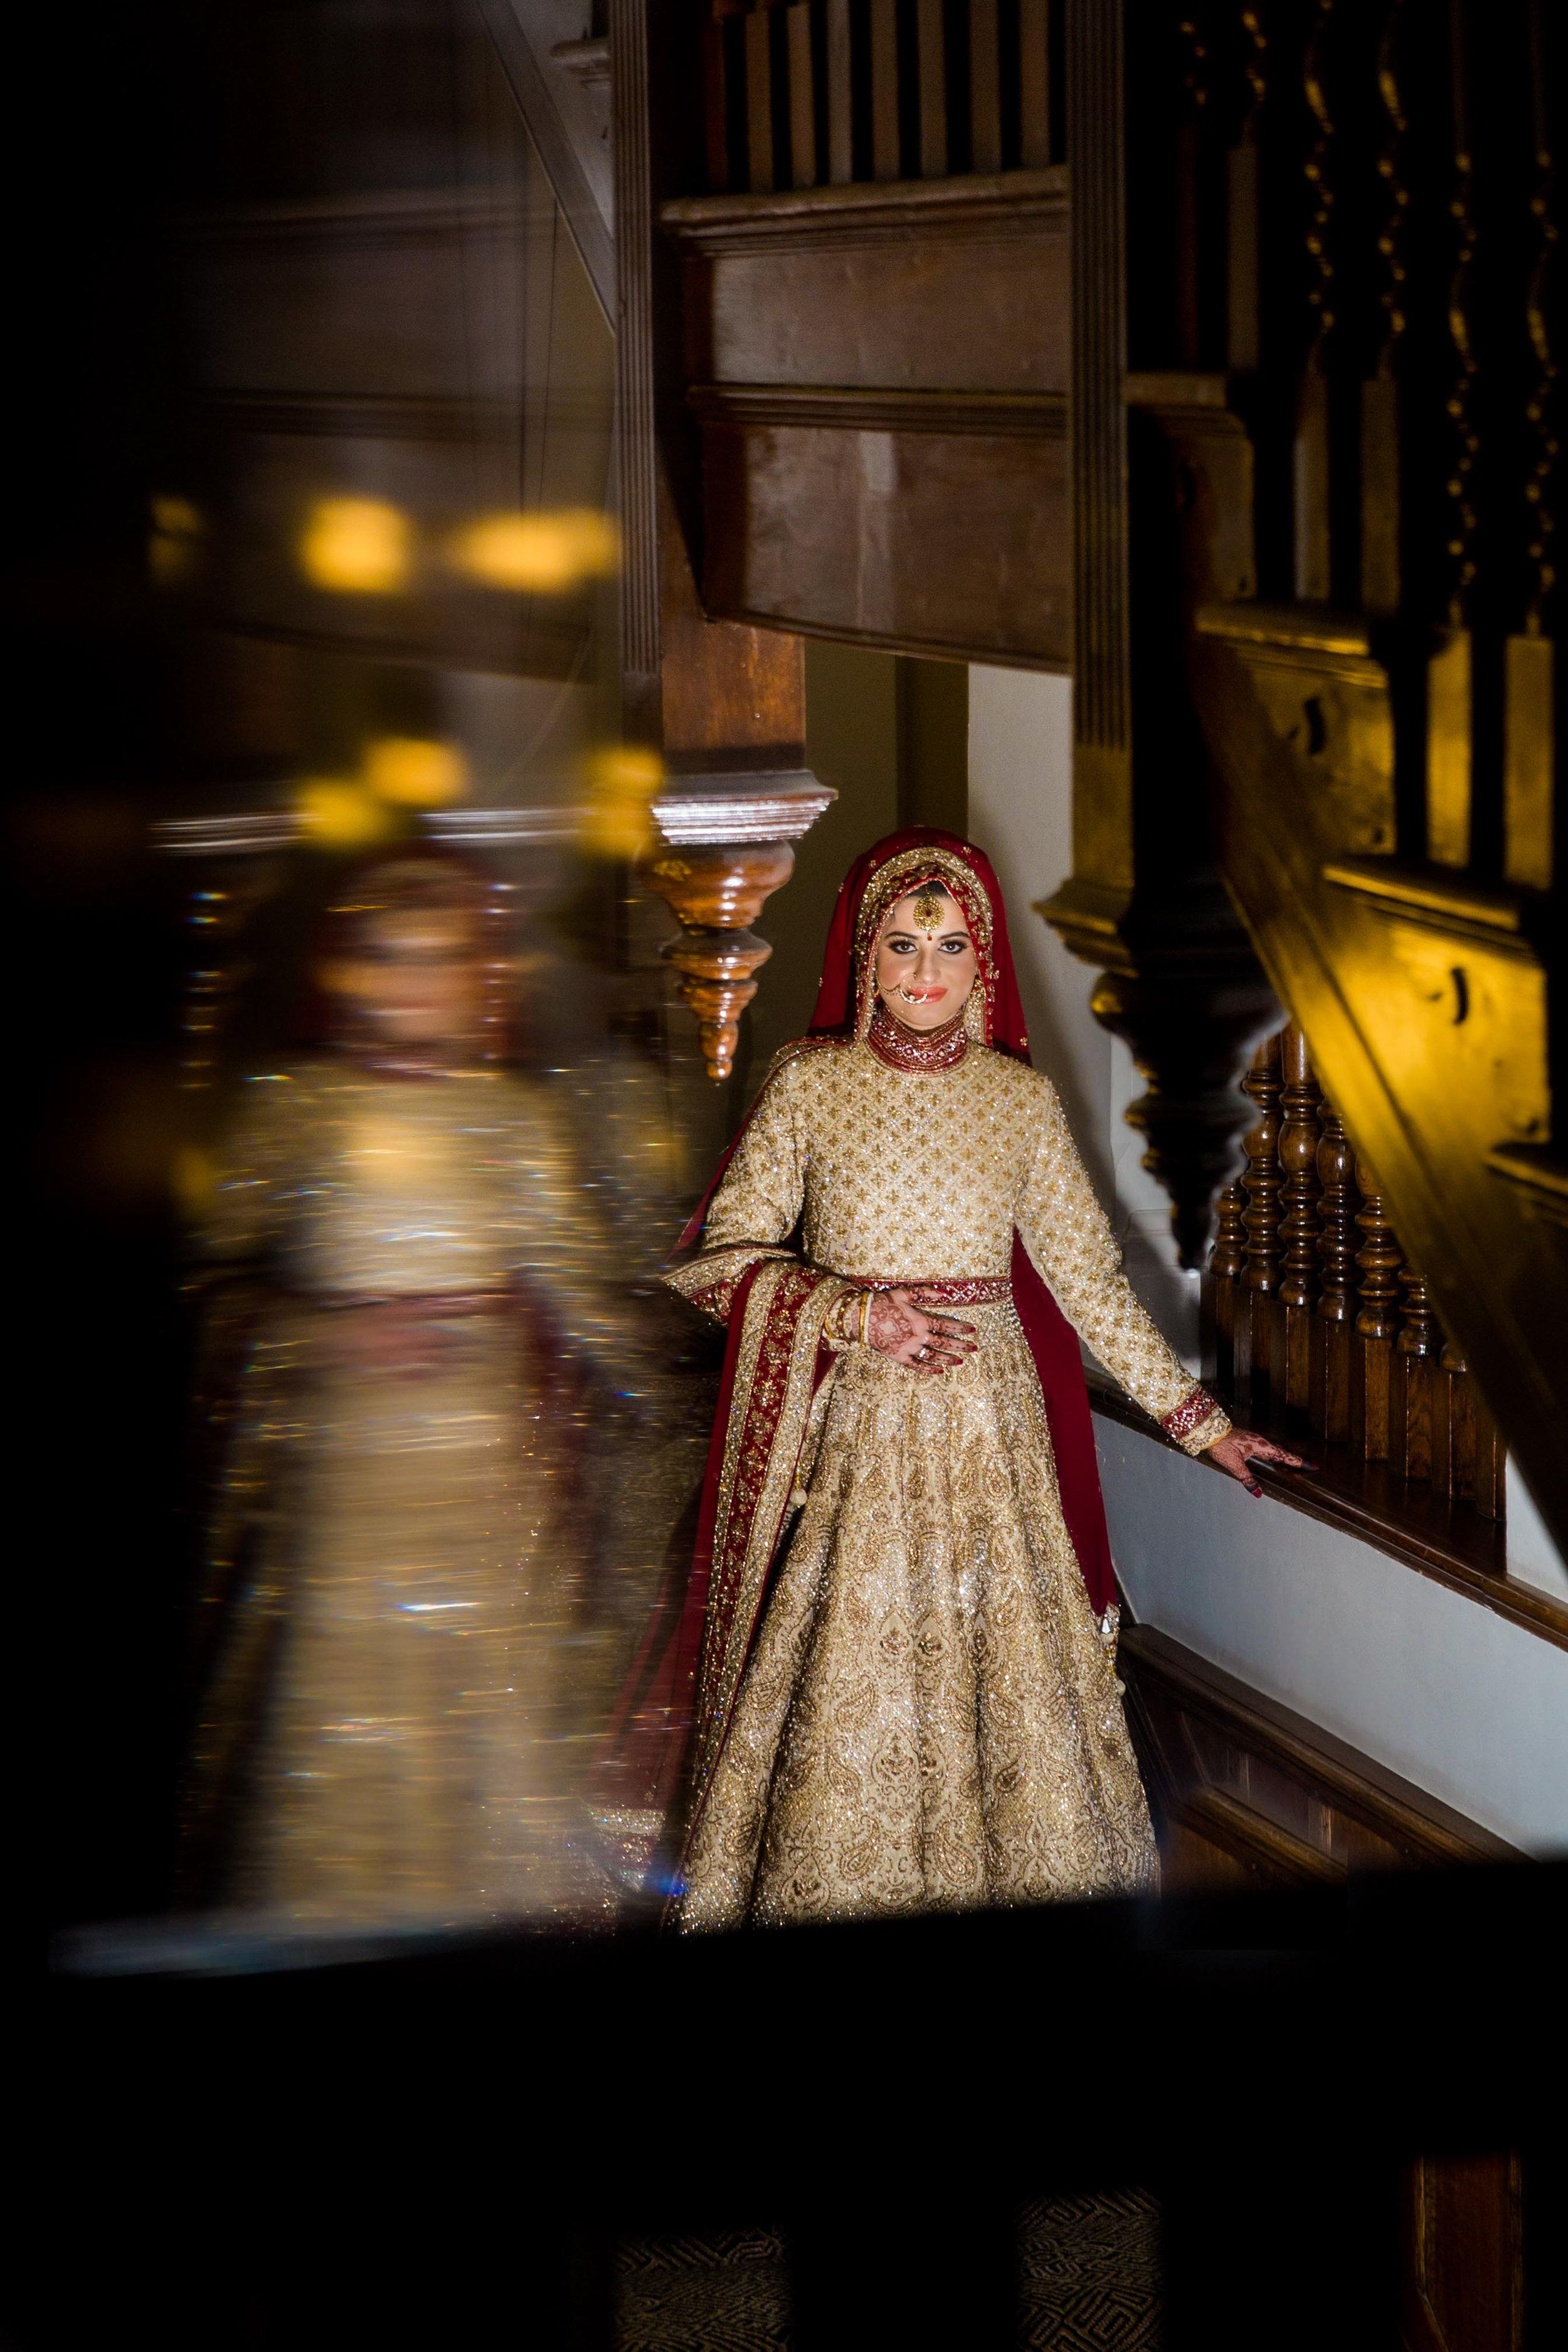 Macdonald-Berystede-Hotel-wedding-female-asian-wedding-photographer-london-natalia-smith-photography-19-2.jpg